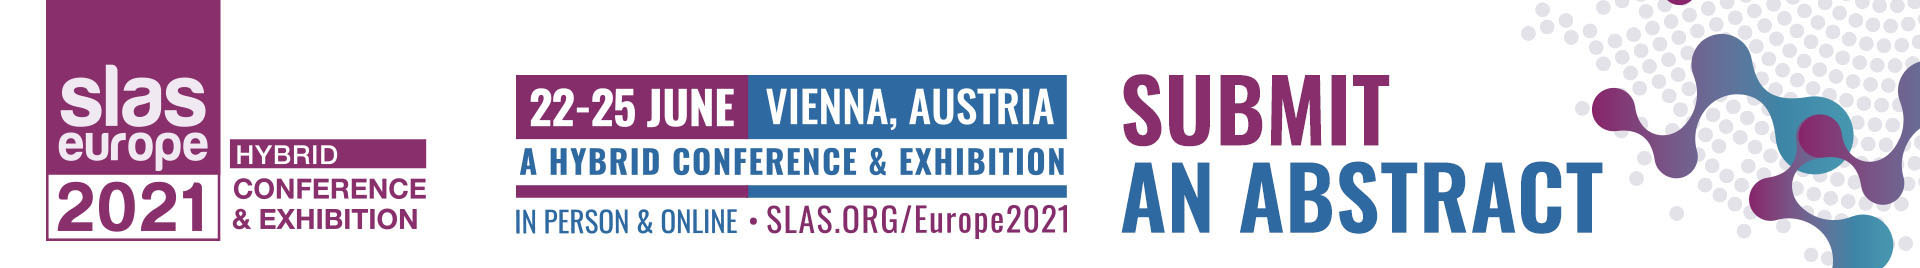 SLAS Europe 2021 Event Event Banner